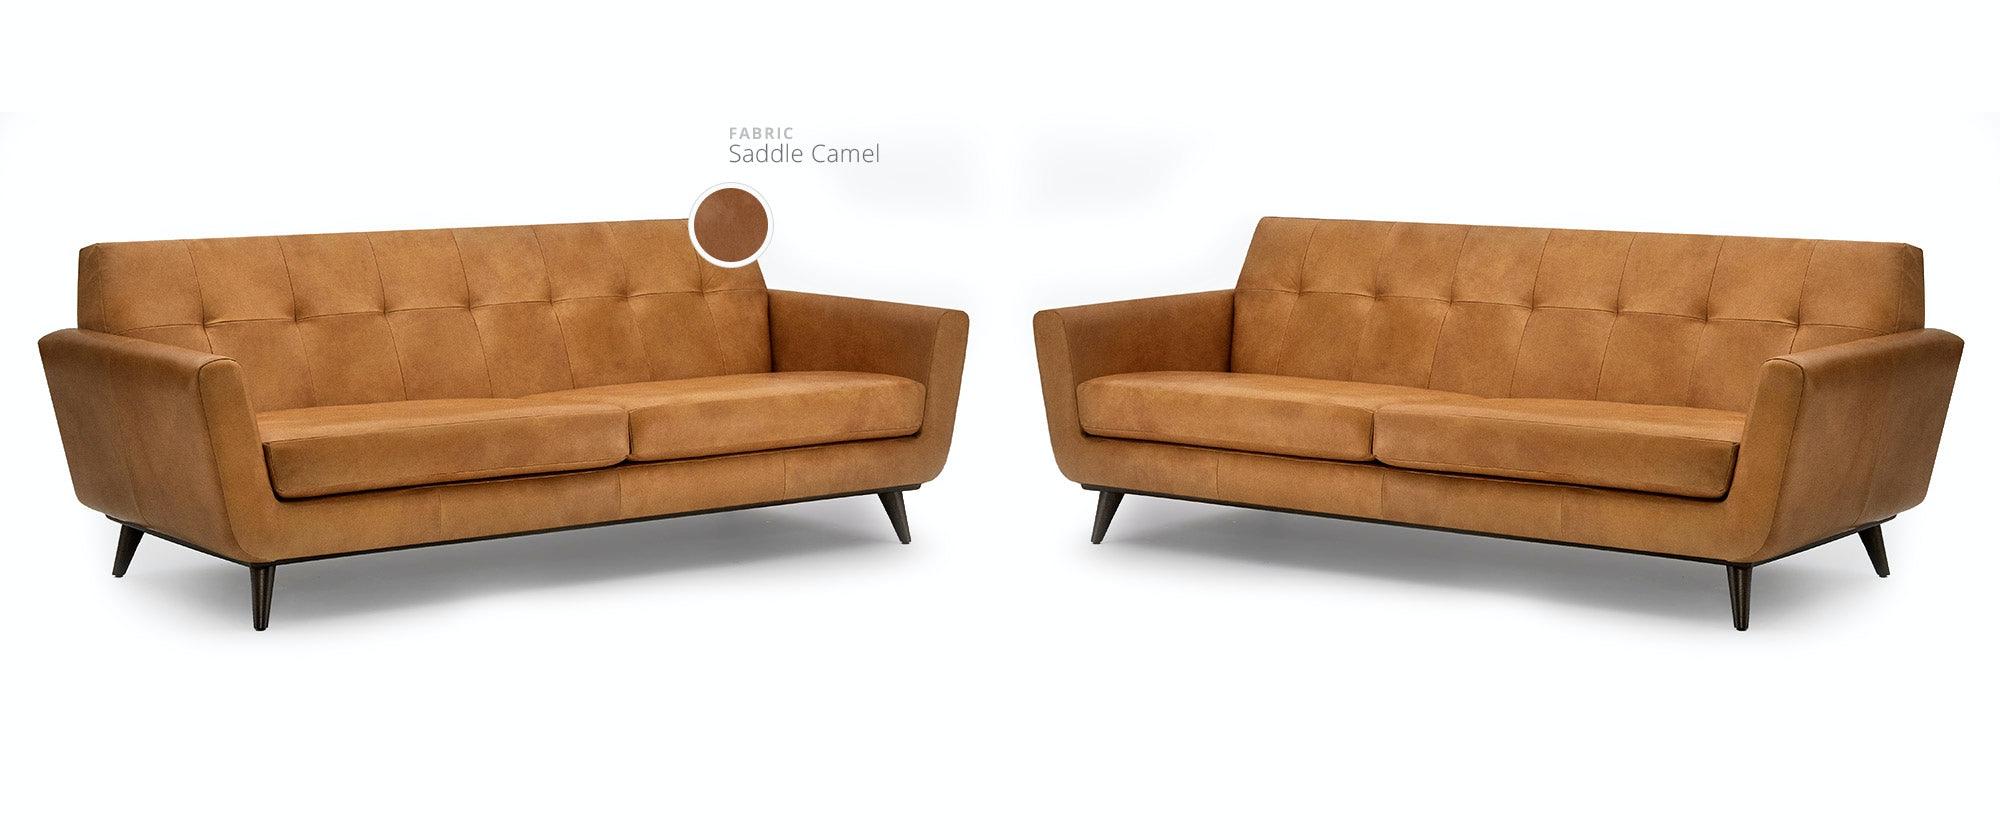 Sensational Hughes Leather Sofa Beatyapartments Chair Design Images Beatyapartmentscom